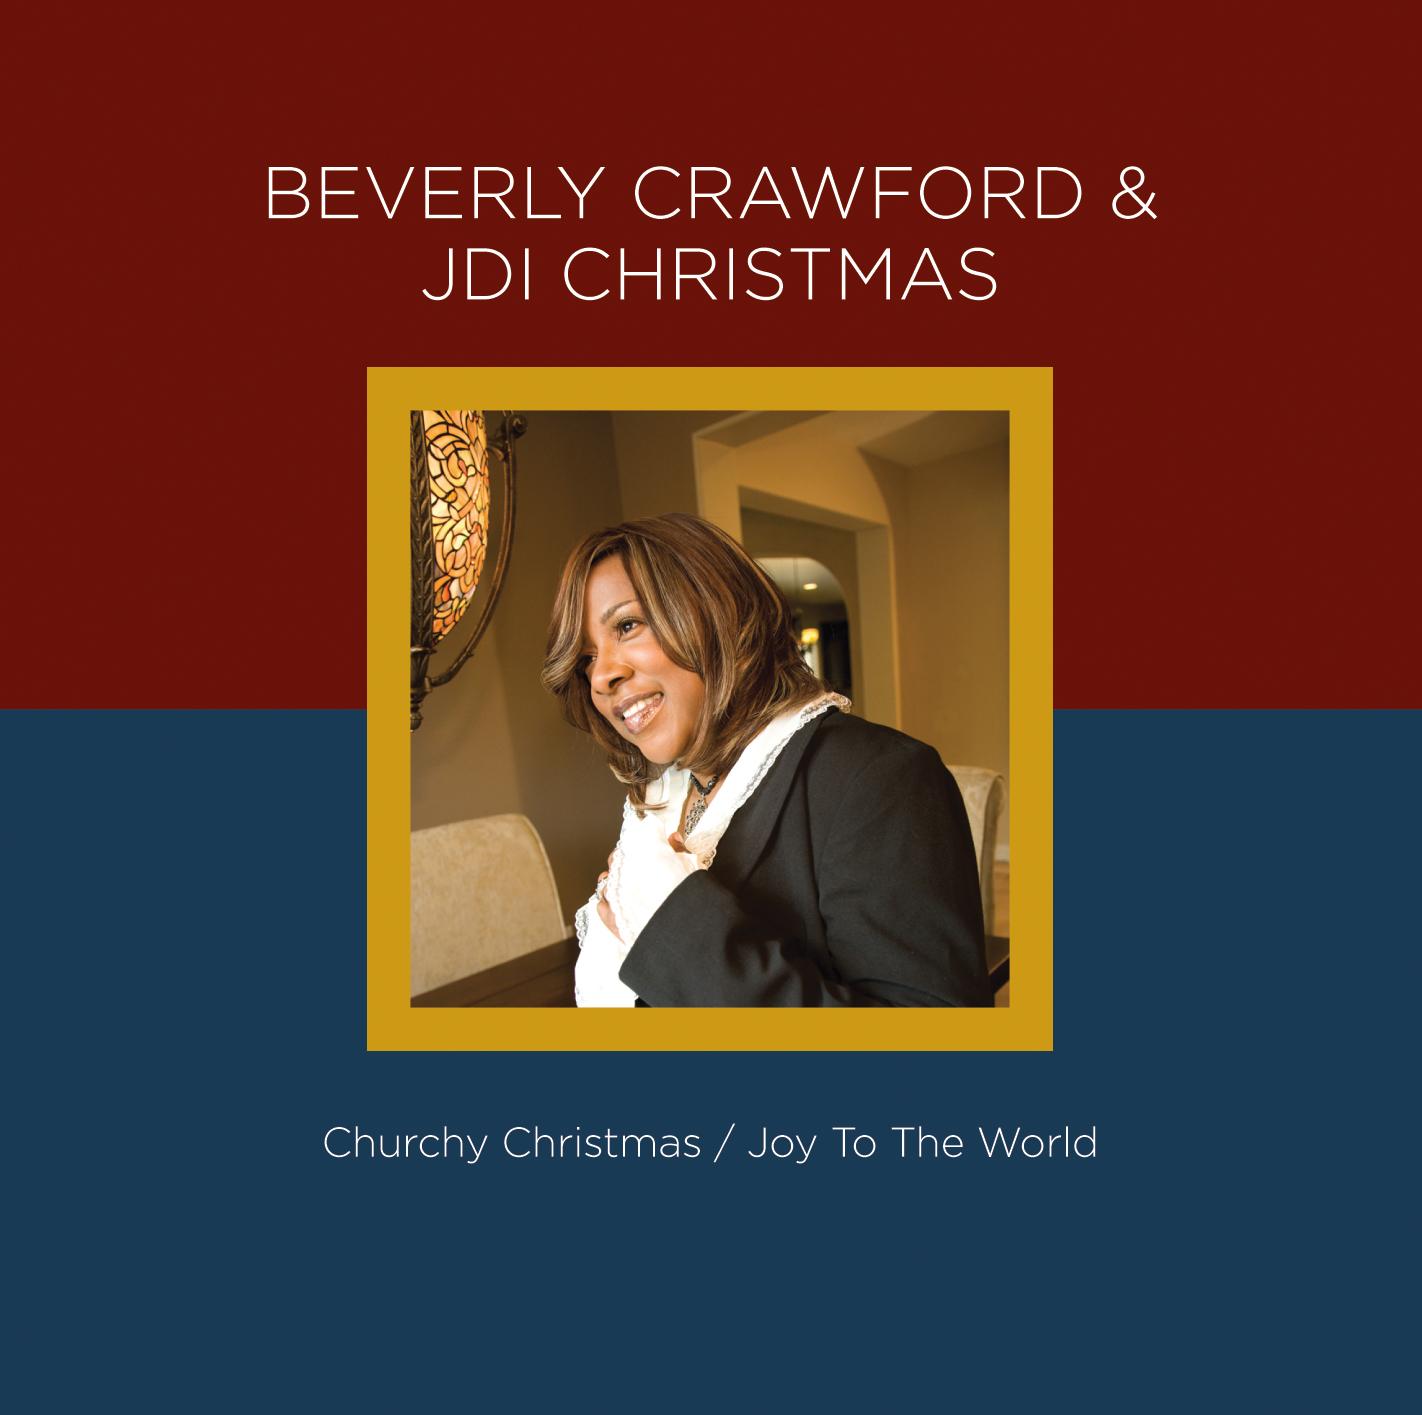 BeverlyCrawford